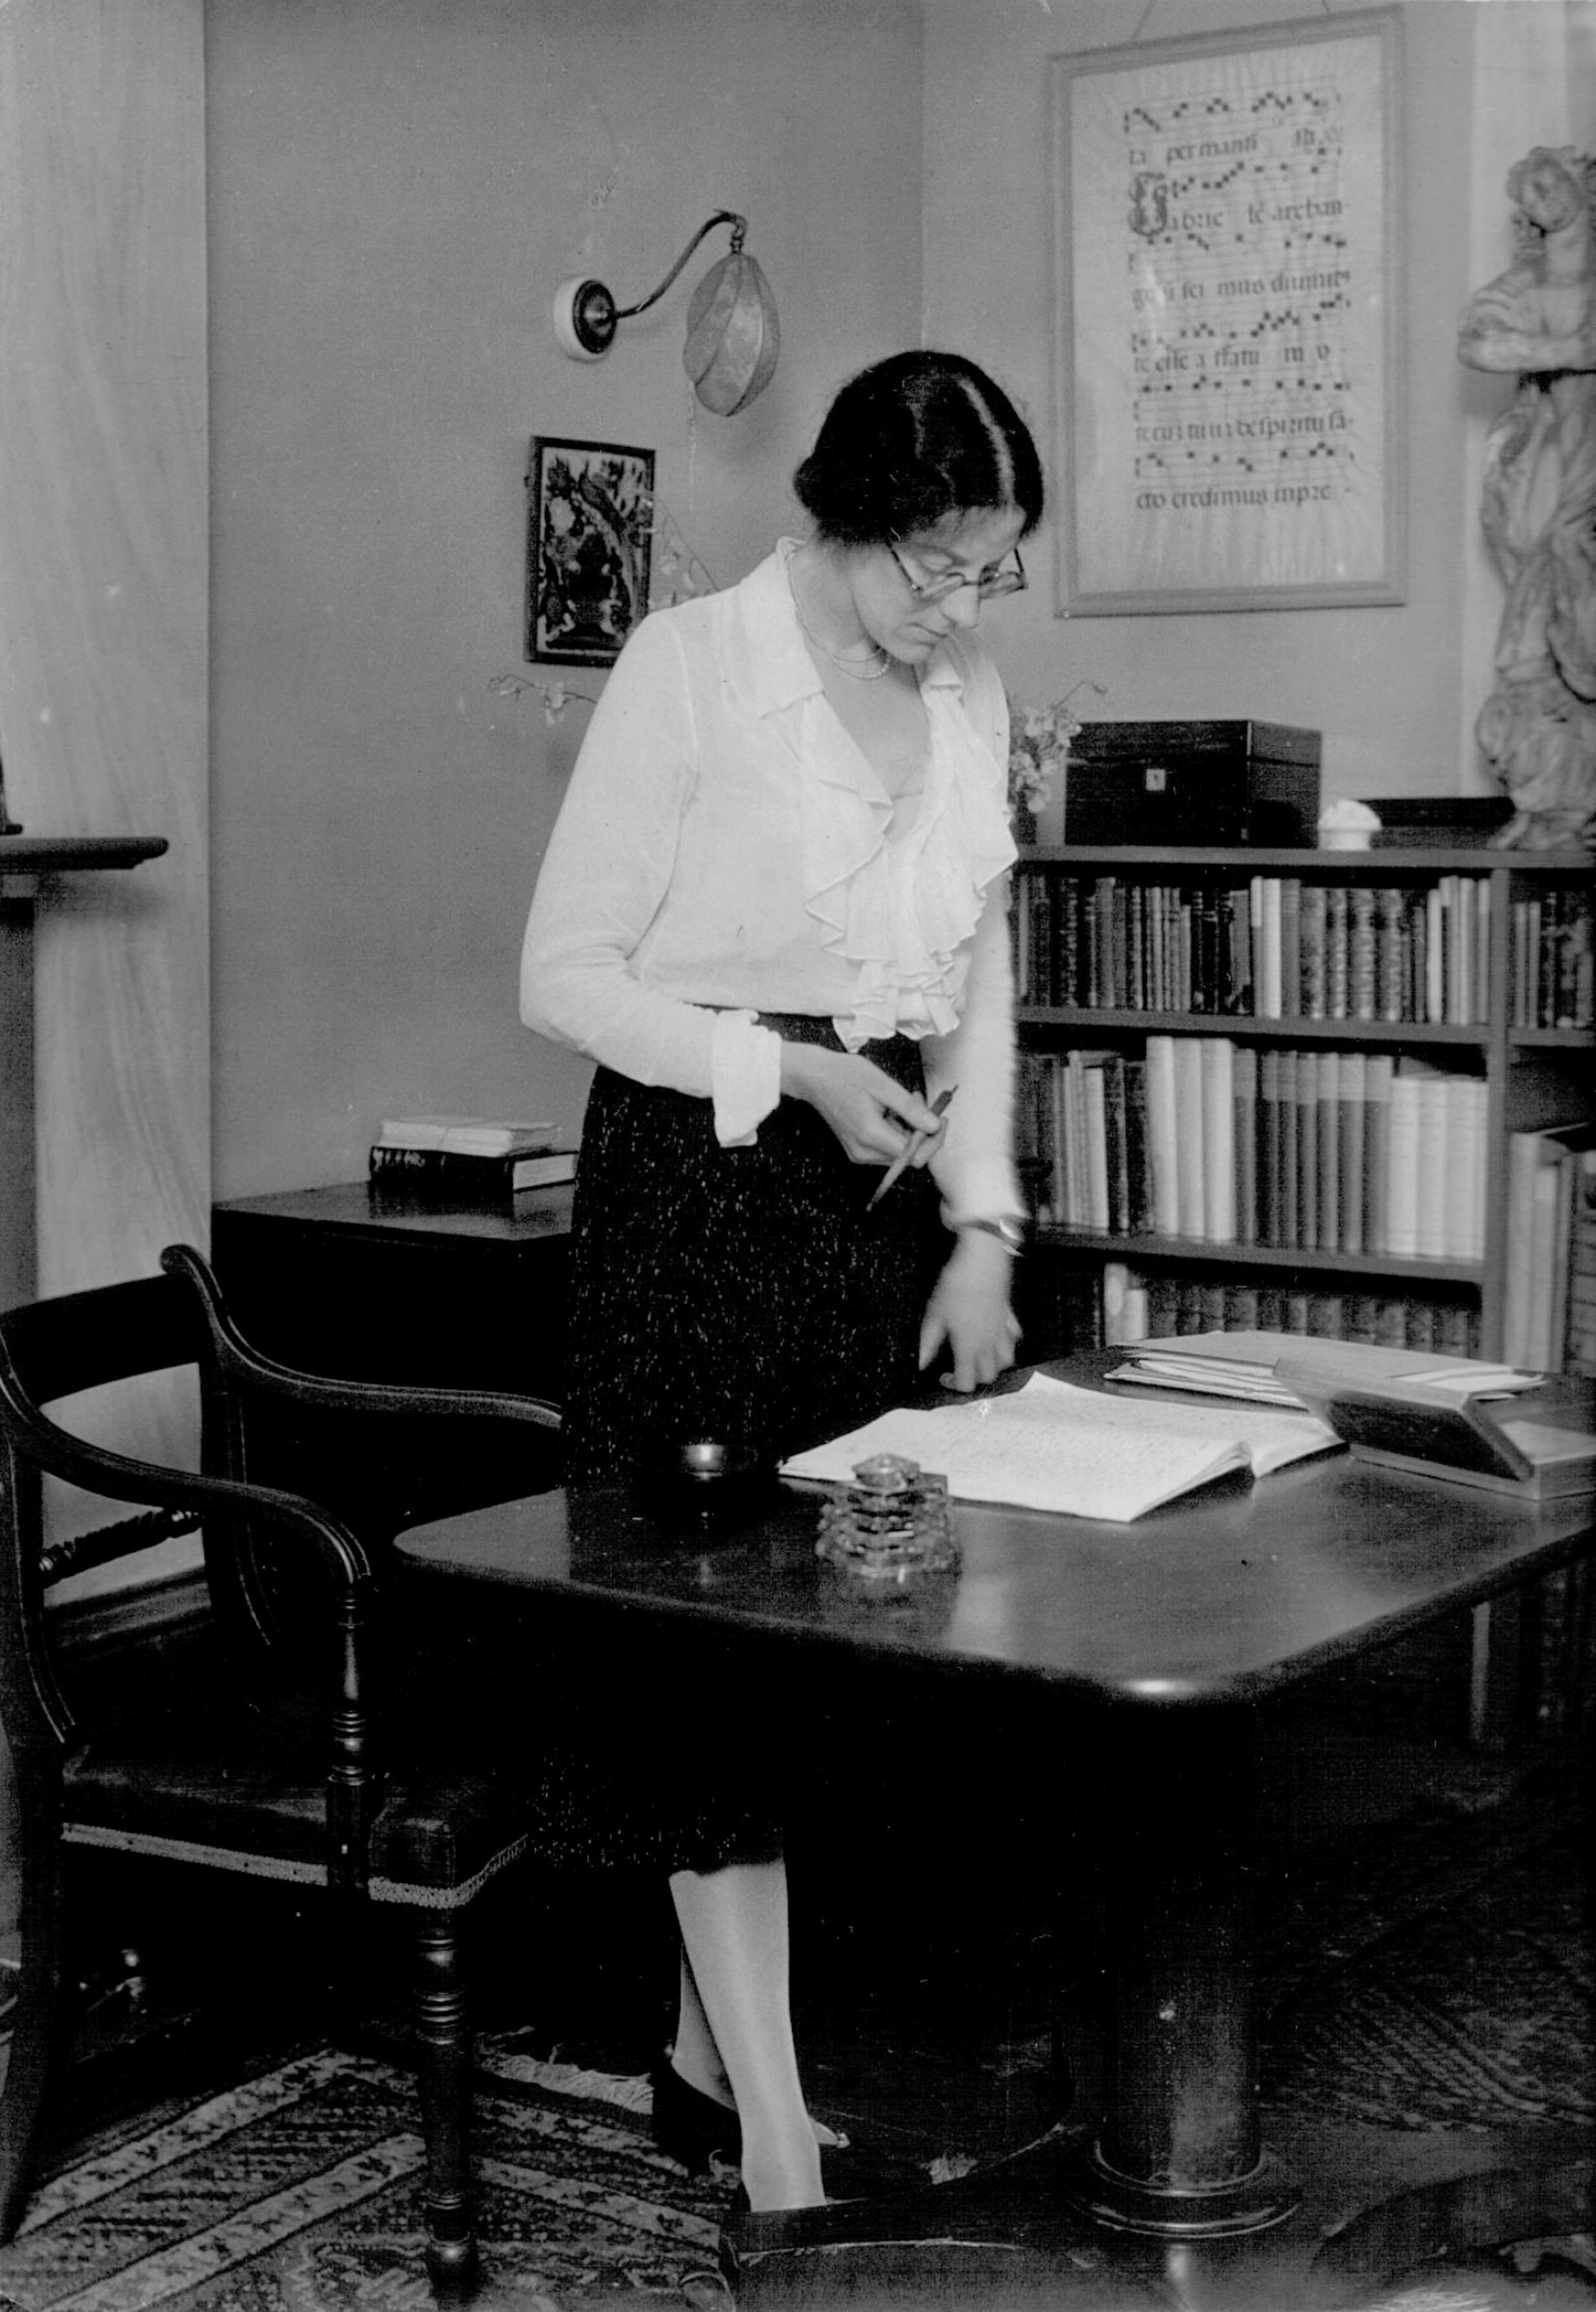 Sylvia Townsend Warner, Inverness, Scotland, 1920s